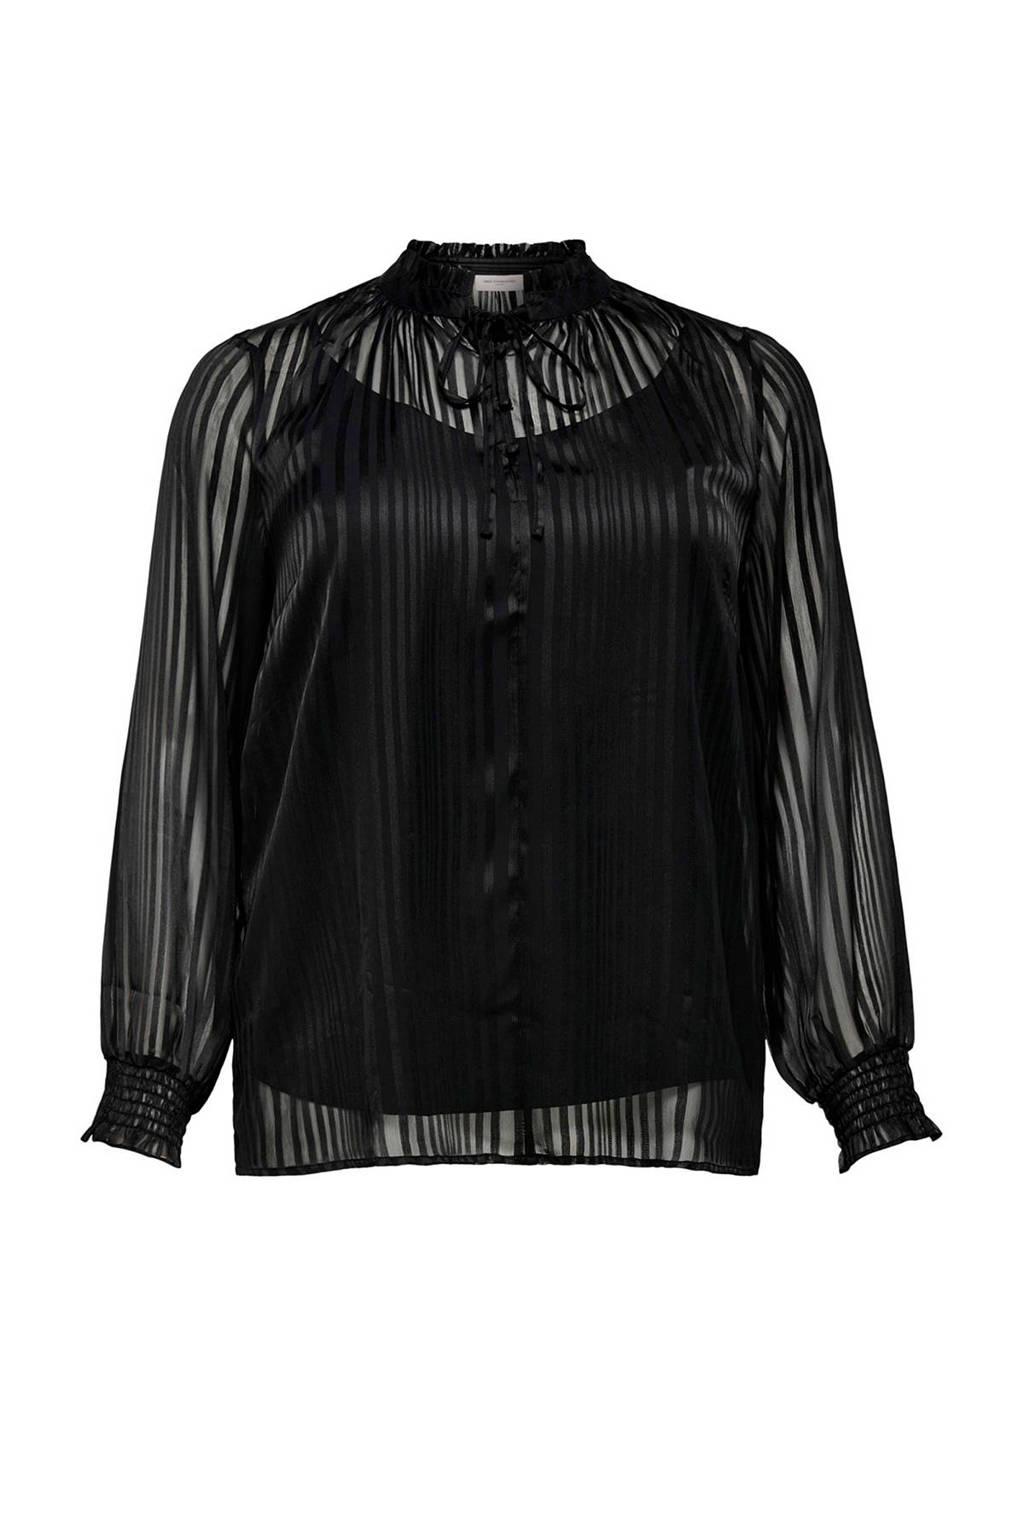 ONLY CARMAKOMA gestreepte semi-transparante top zwart, Zwart